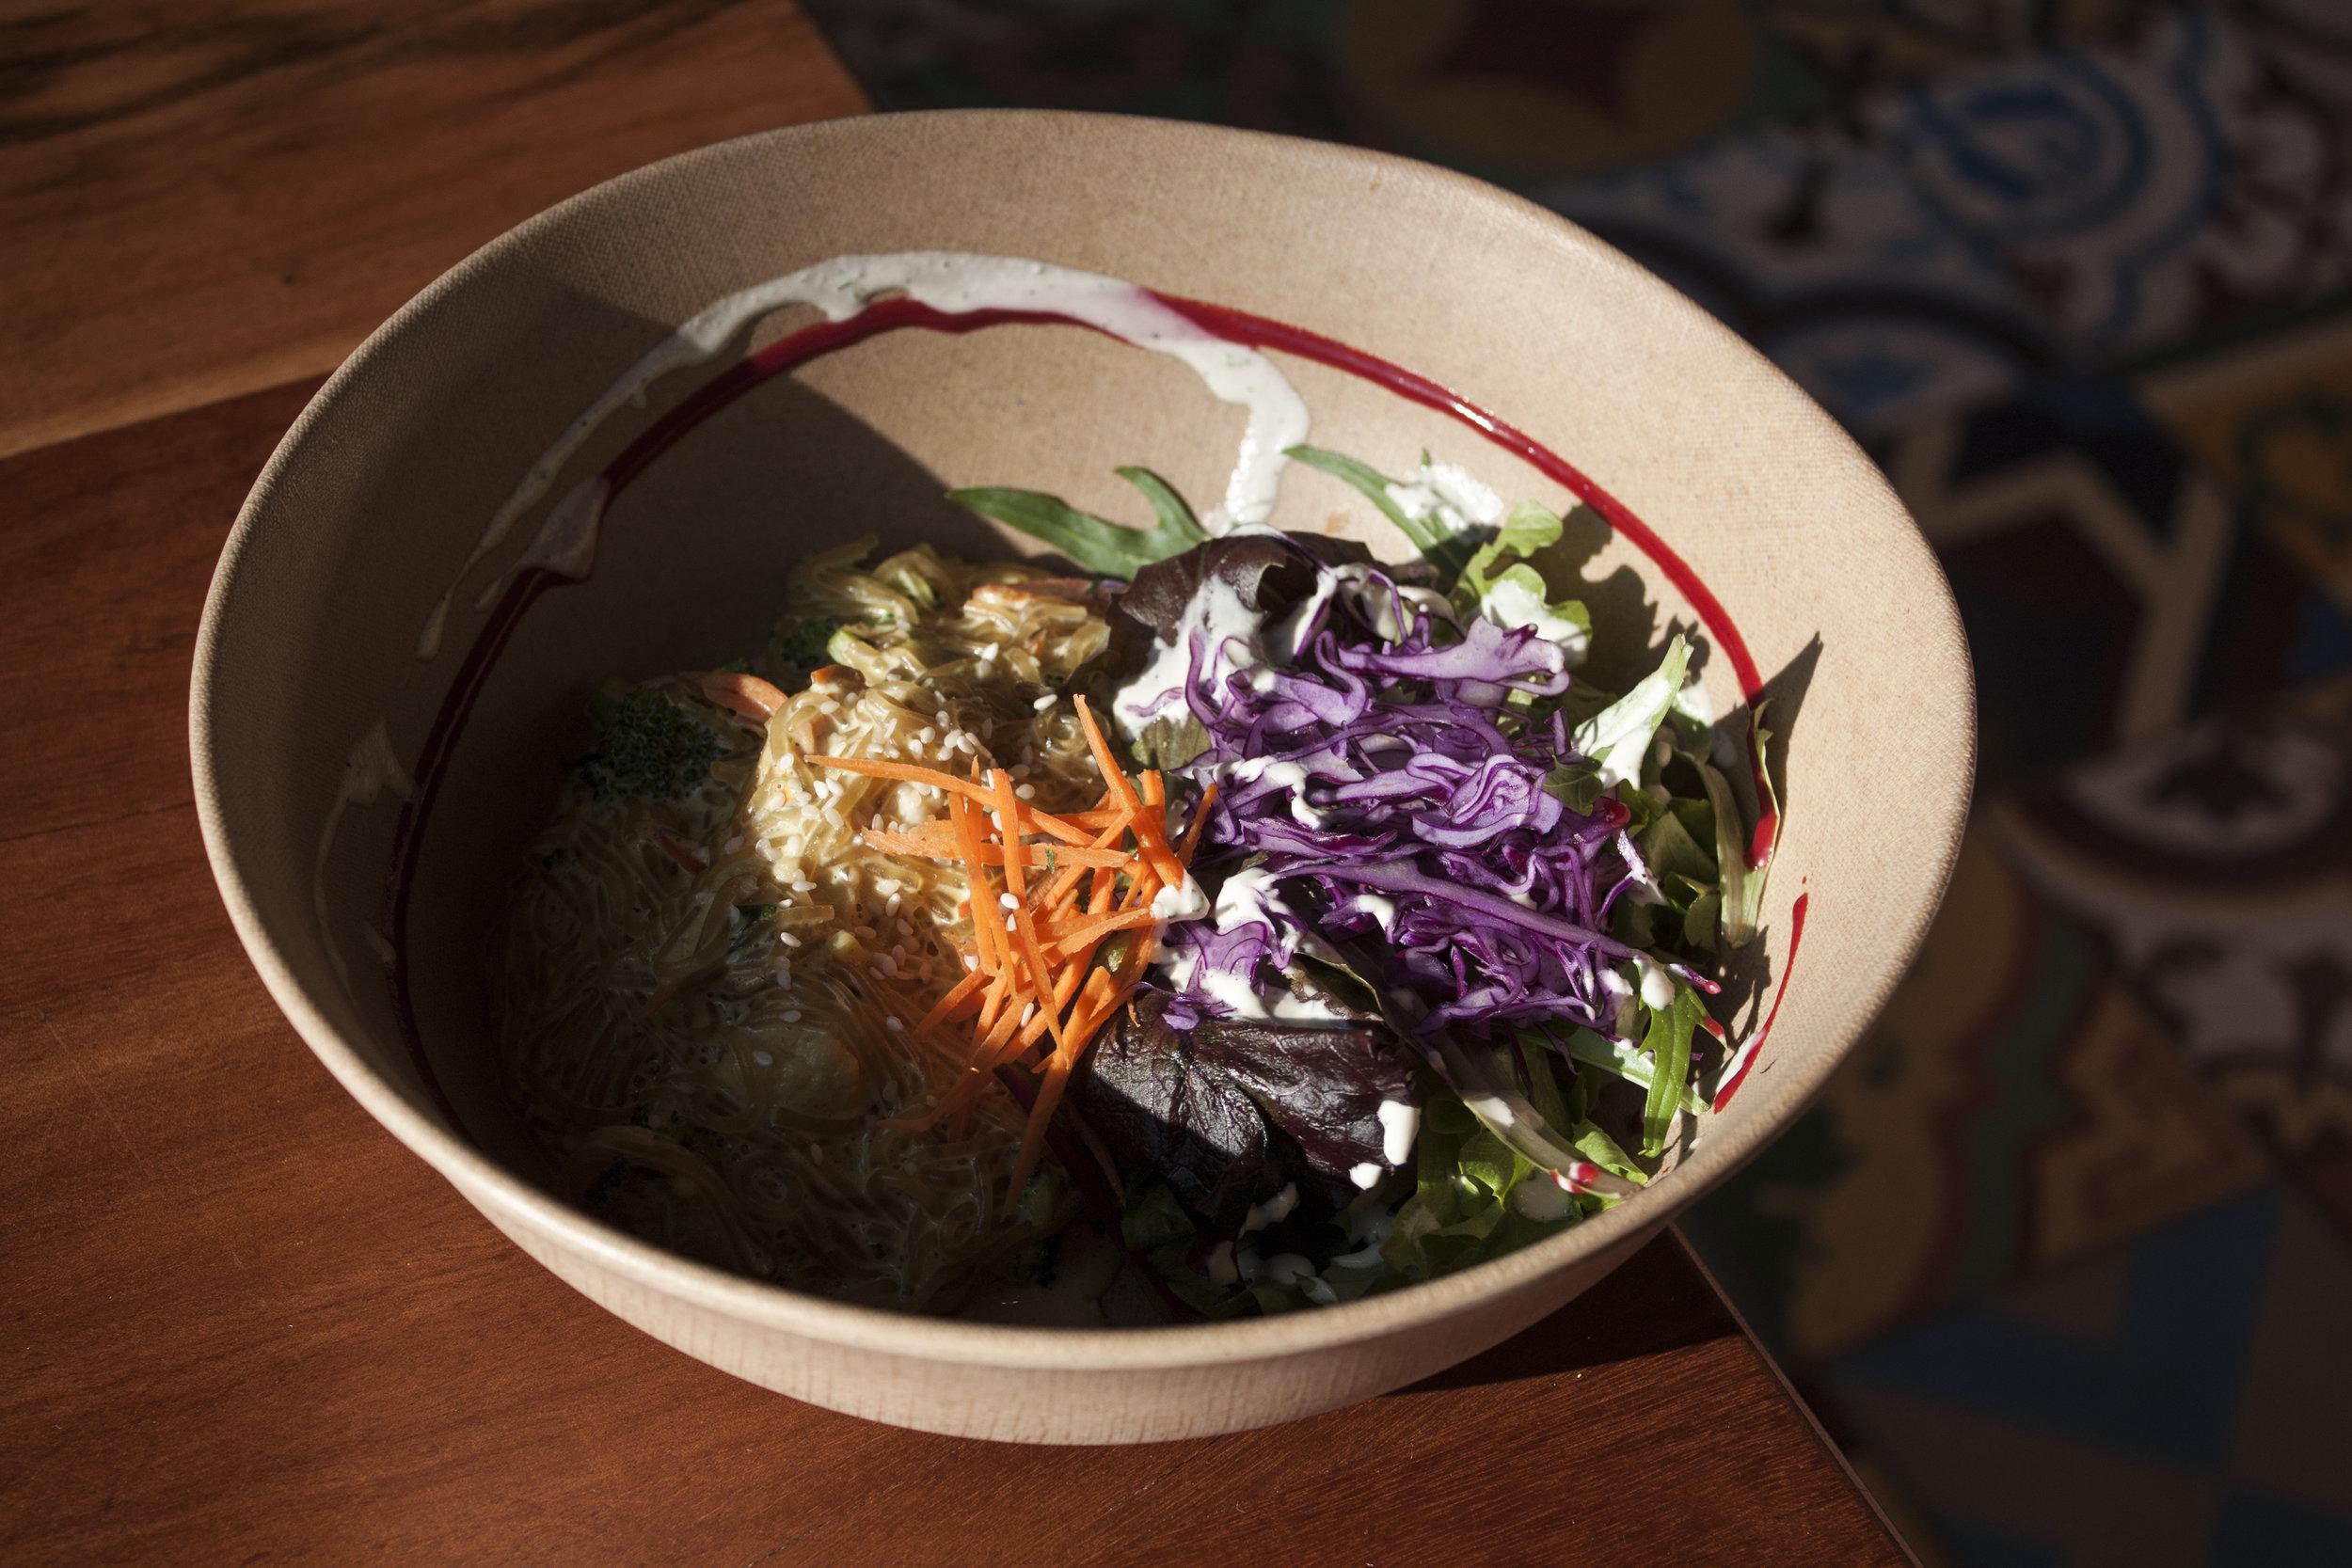 Wild Living Foods located in Downtown is one of the best vegan restaurants in LA. Vegan pad thai aka Rad Thai is a must order.